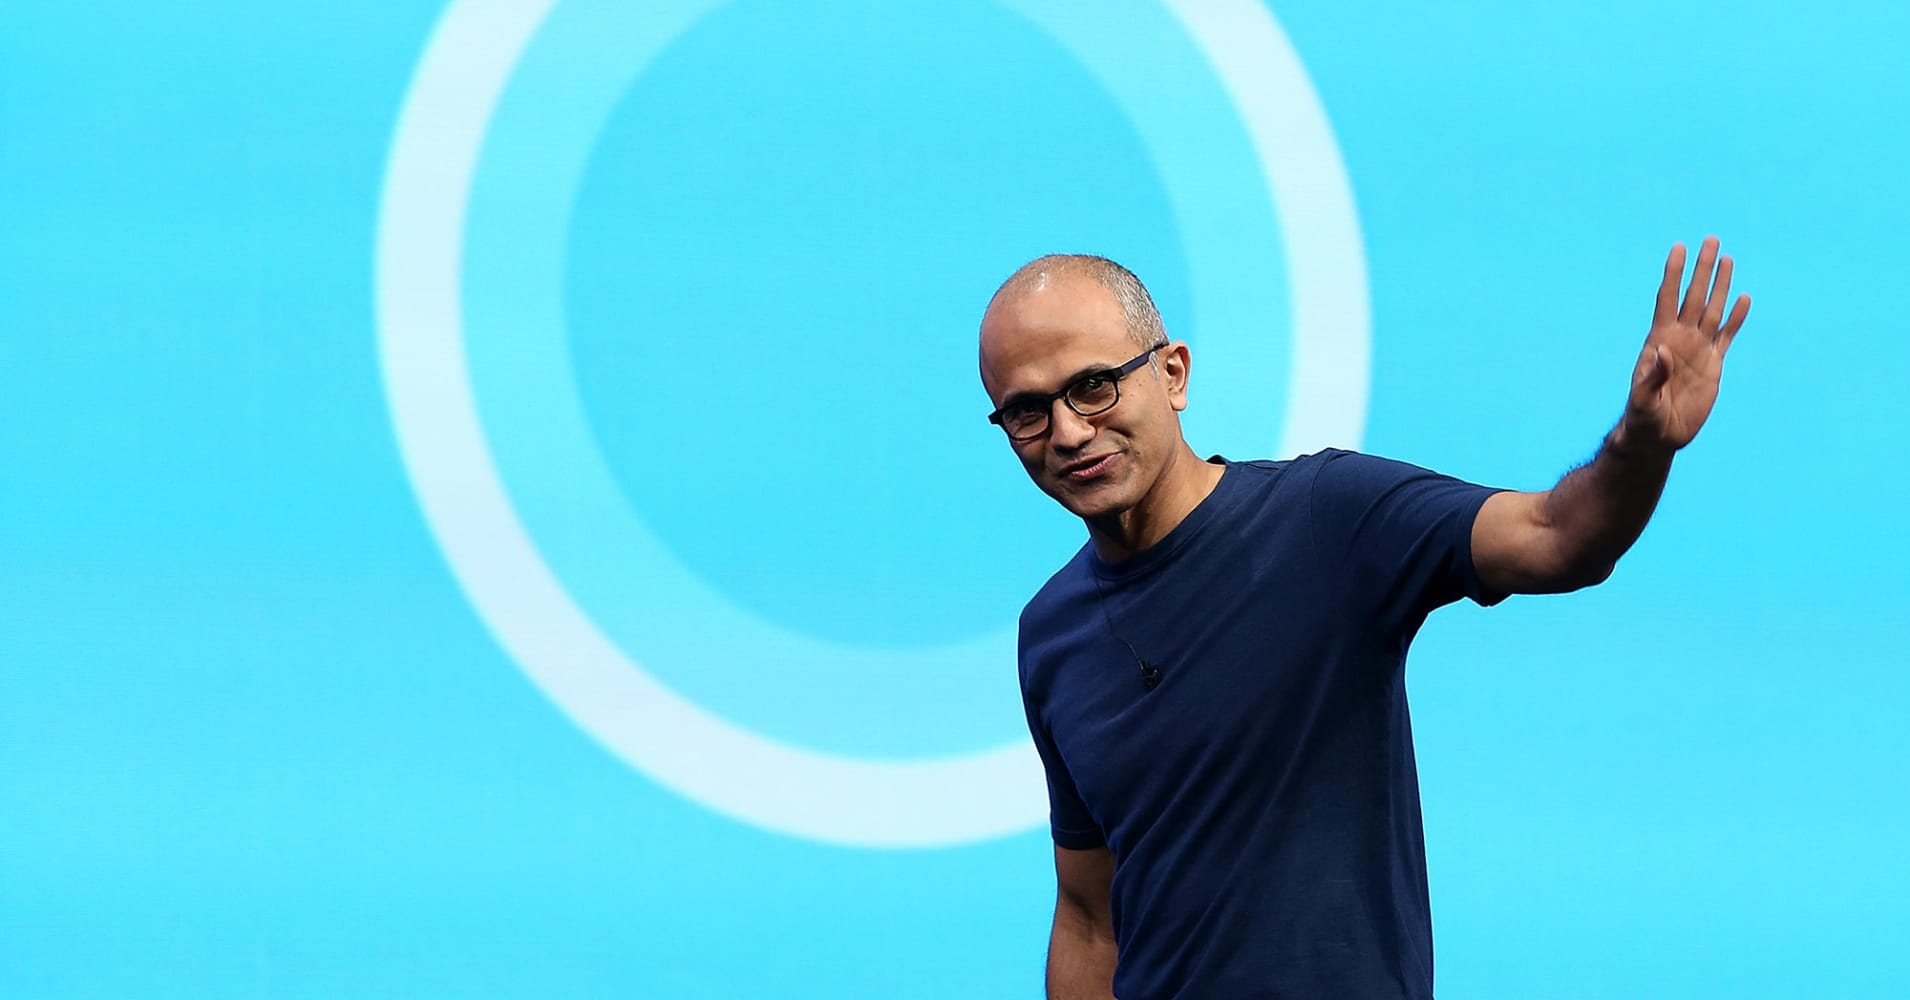 Microsoft CEO Satya Nadella walks in front of the Cortana logo.